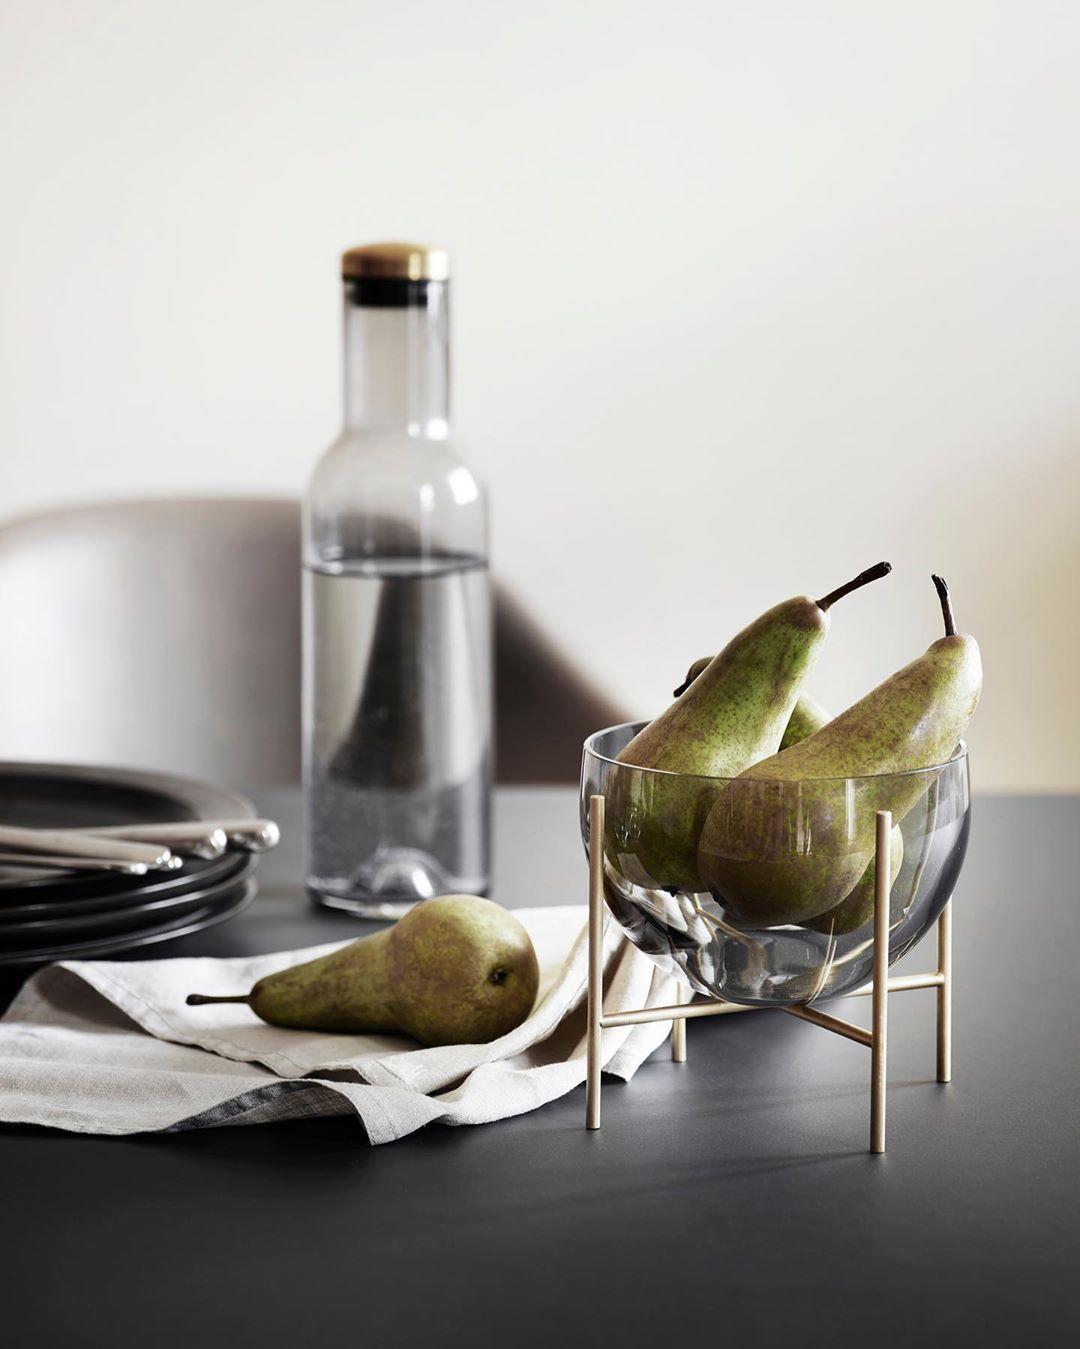 Pin By Danuta Nikiel On Kitchen Smoked Glass Menu Furniture Glass Bowl